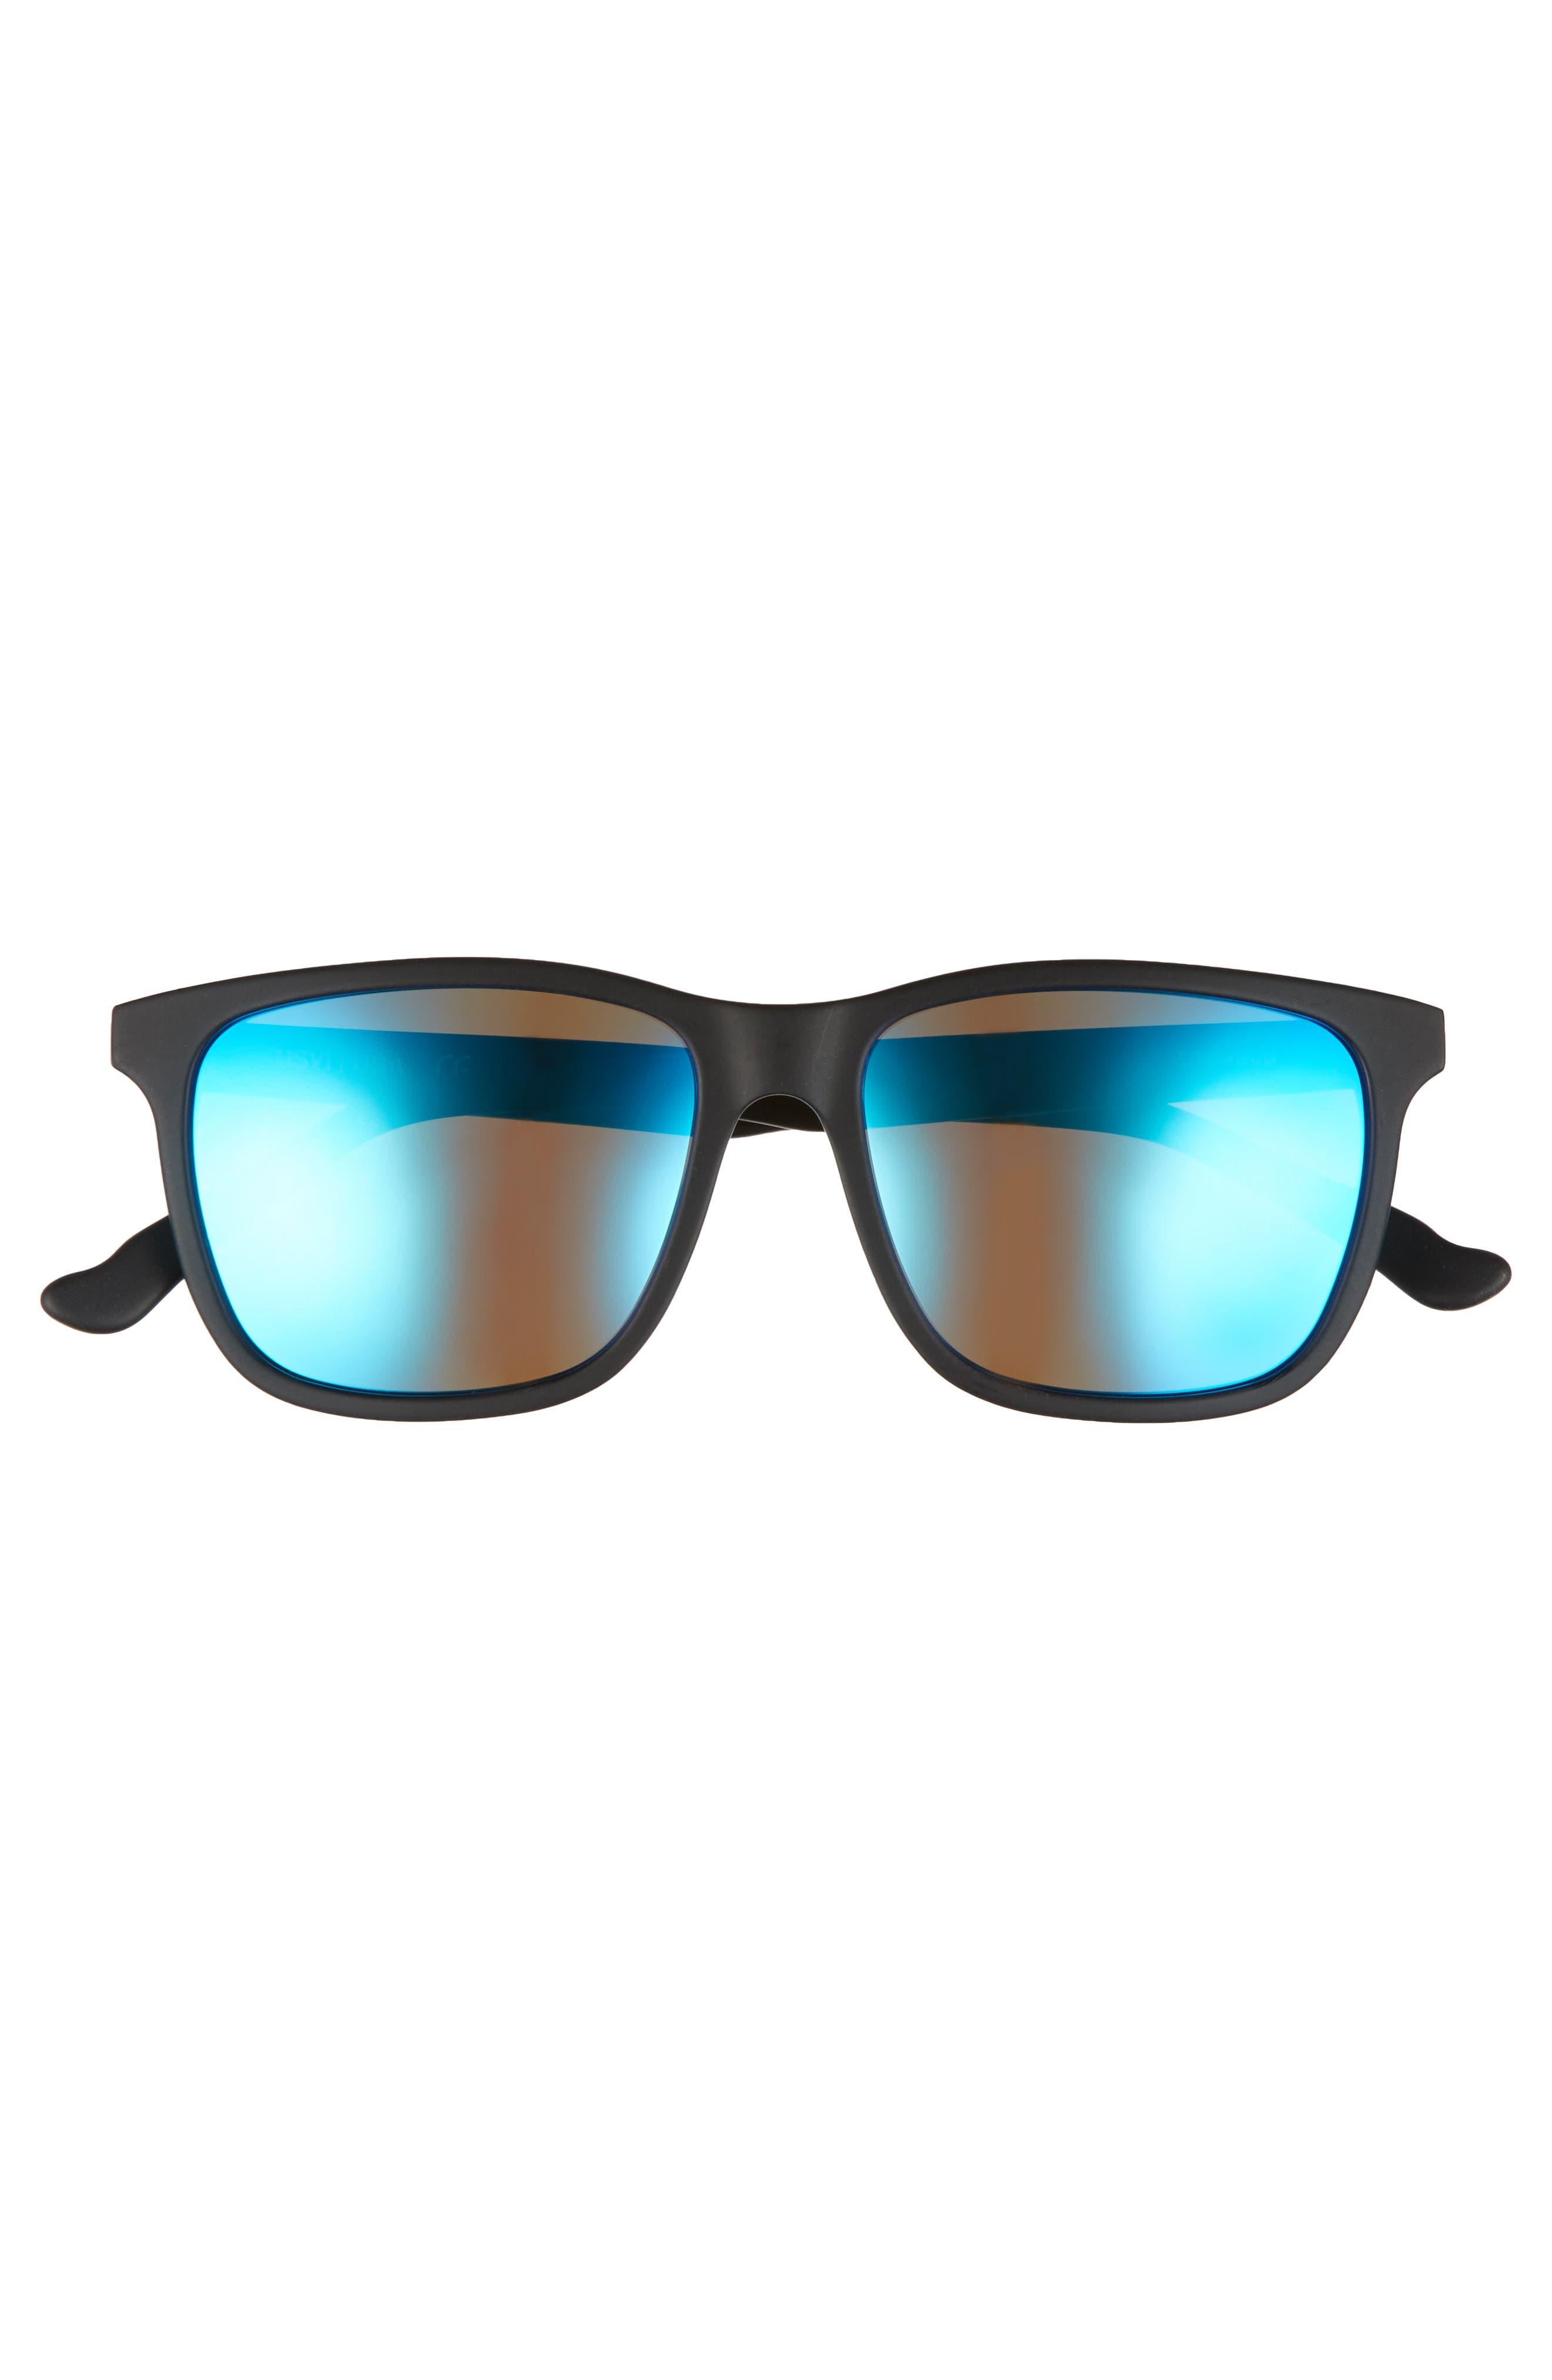 Uluwatu 52mm Polarized Sunglasses,                             Alternate thumbnail 3, color,                             Charcoal